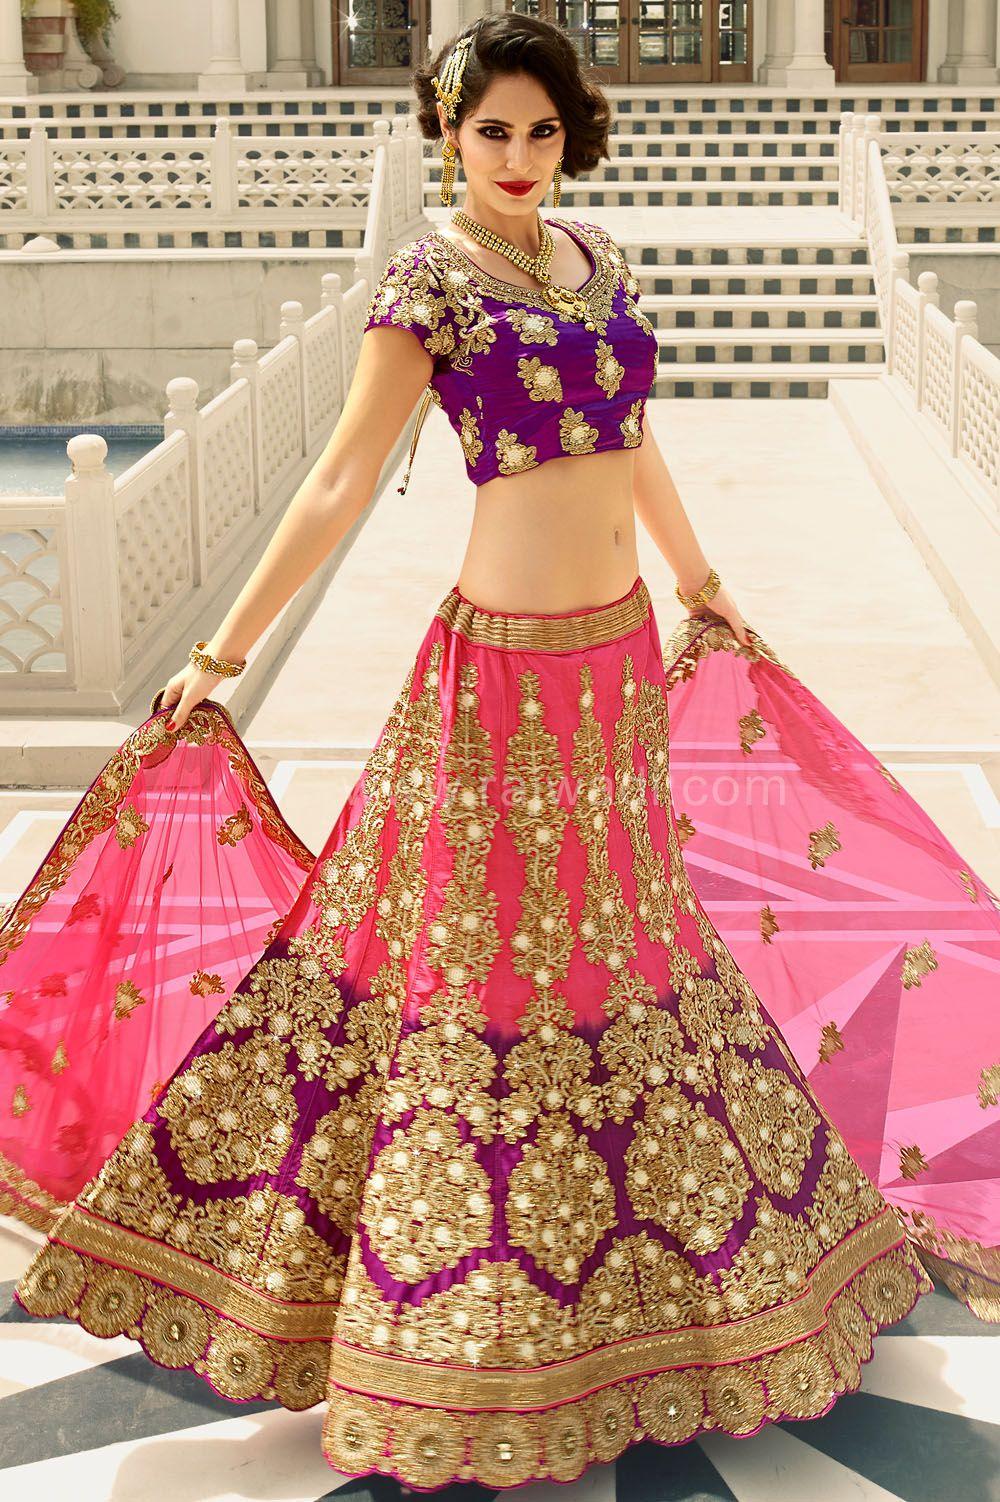 e9fb0ab3db Gorgeous Art Silk fabric Hot Pink and Purple coloured Lehenga is  beautifully crafted with resham, zari, stone, pita, sequins, diamond work  and designer cut ...